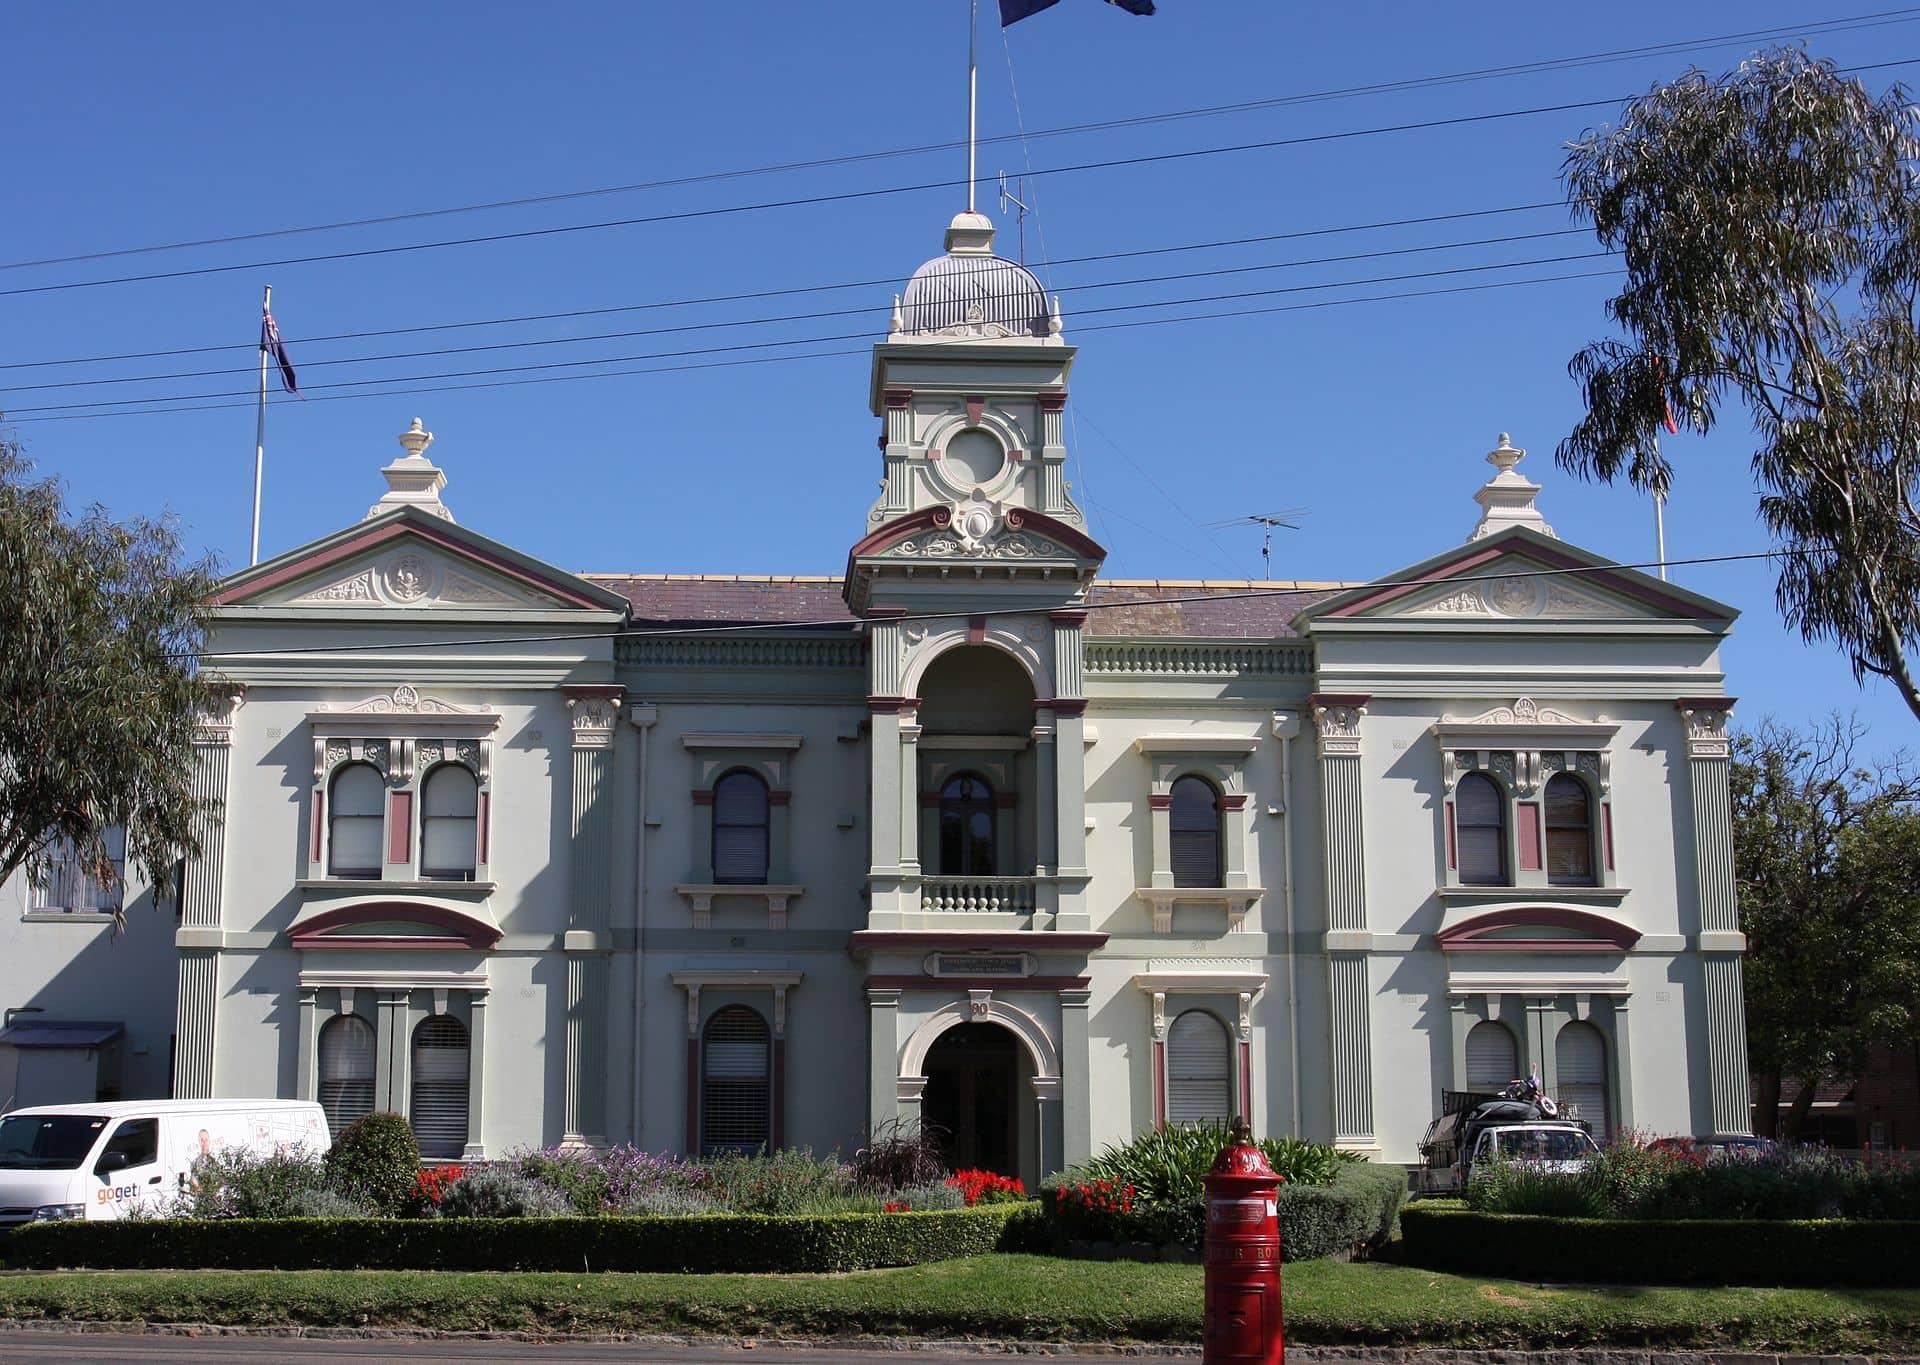 Randwick Town Hall, Avoca Street -  Randwick, NSW